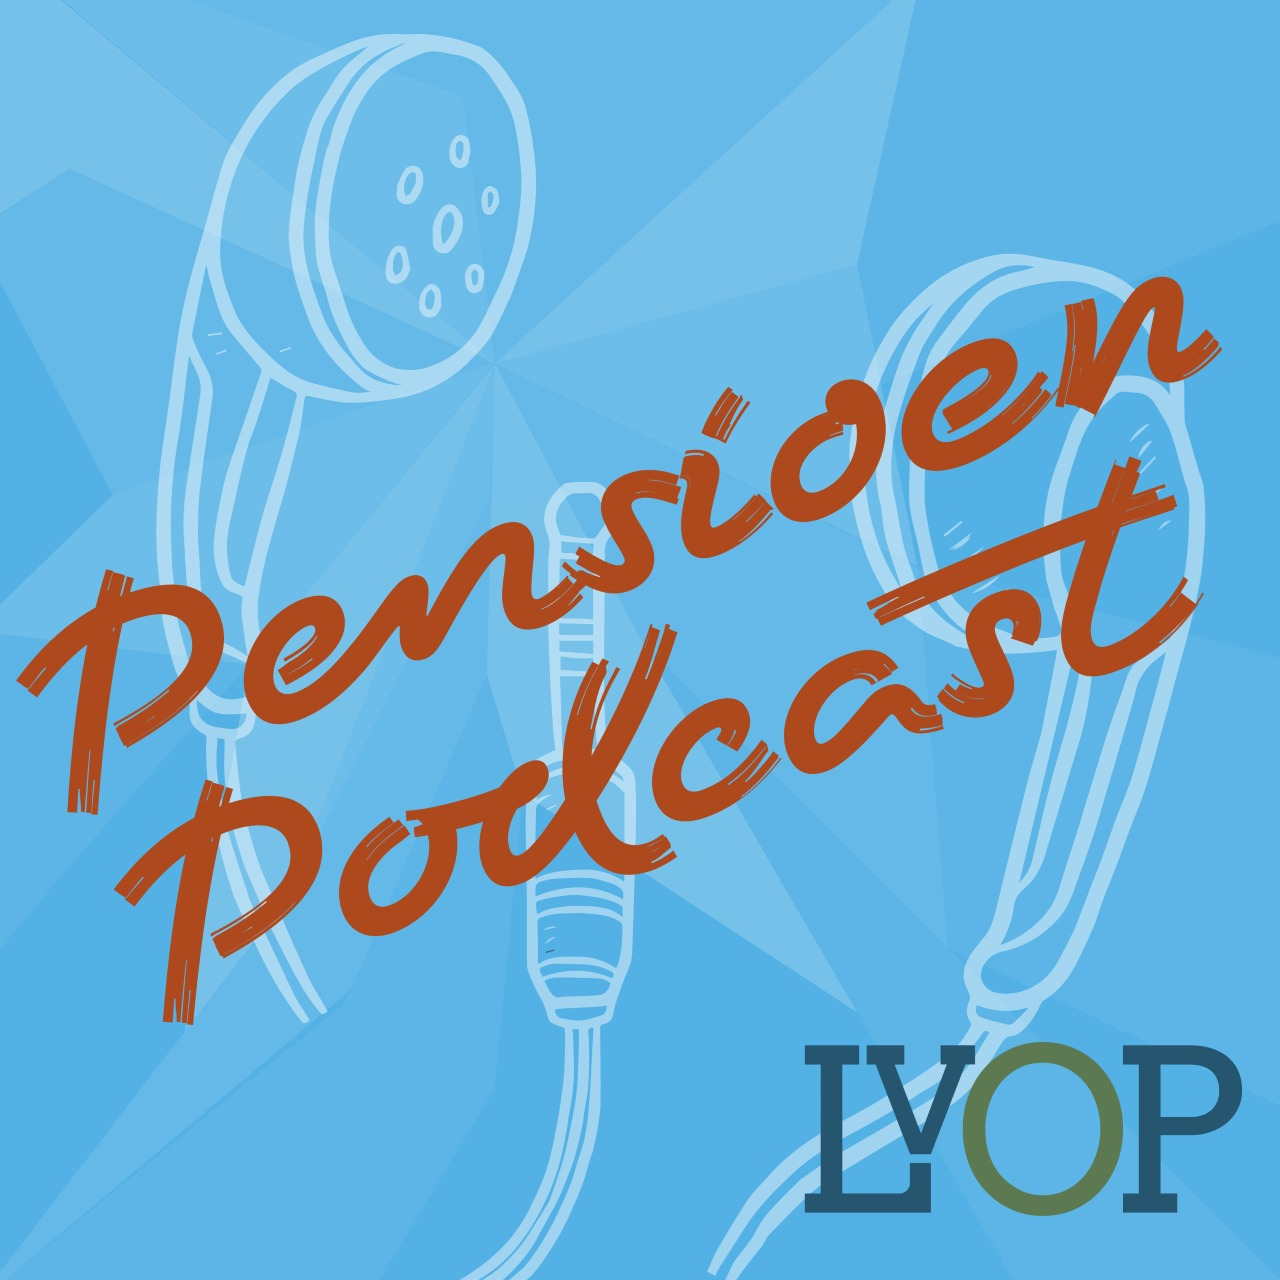 albumart pensioen podcast